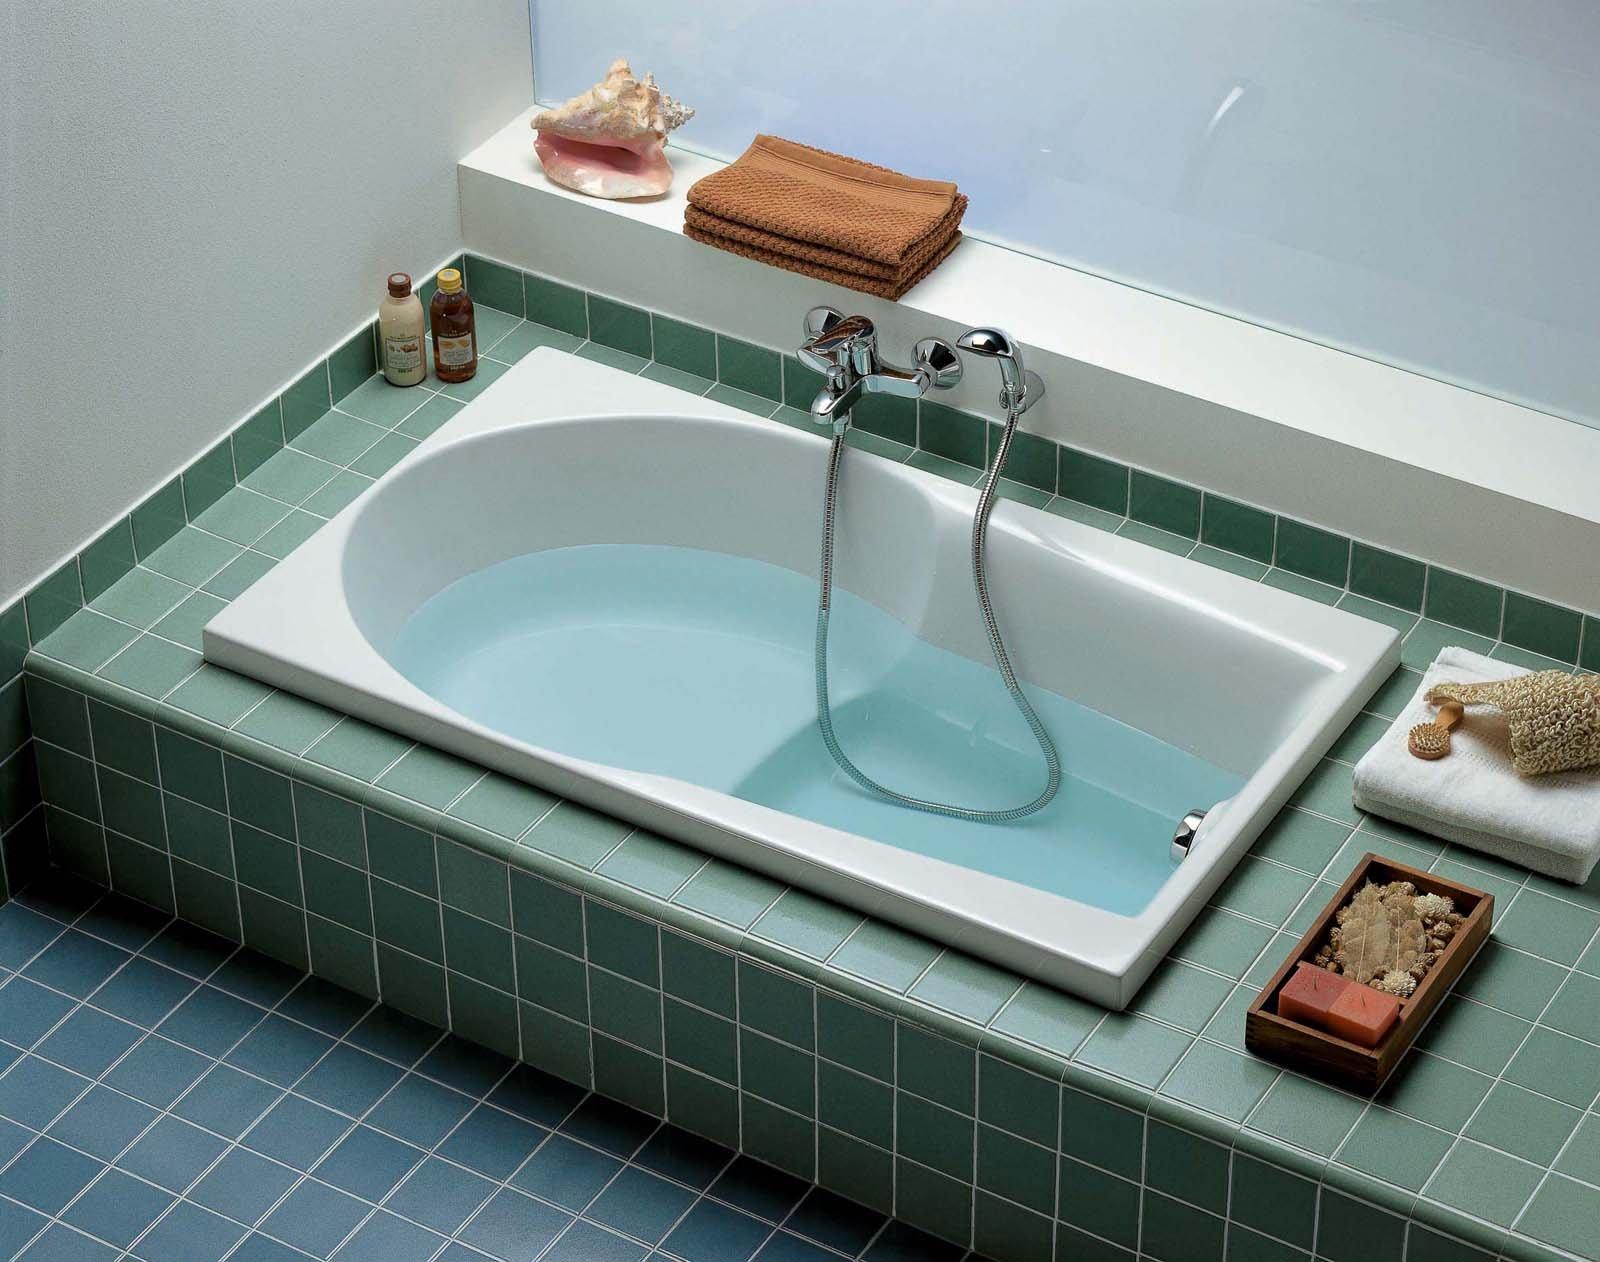 Vasche da bagno low cost a partire da 182 euro cose di casa - Vasche da bagno rotonde ...